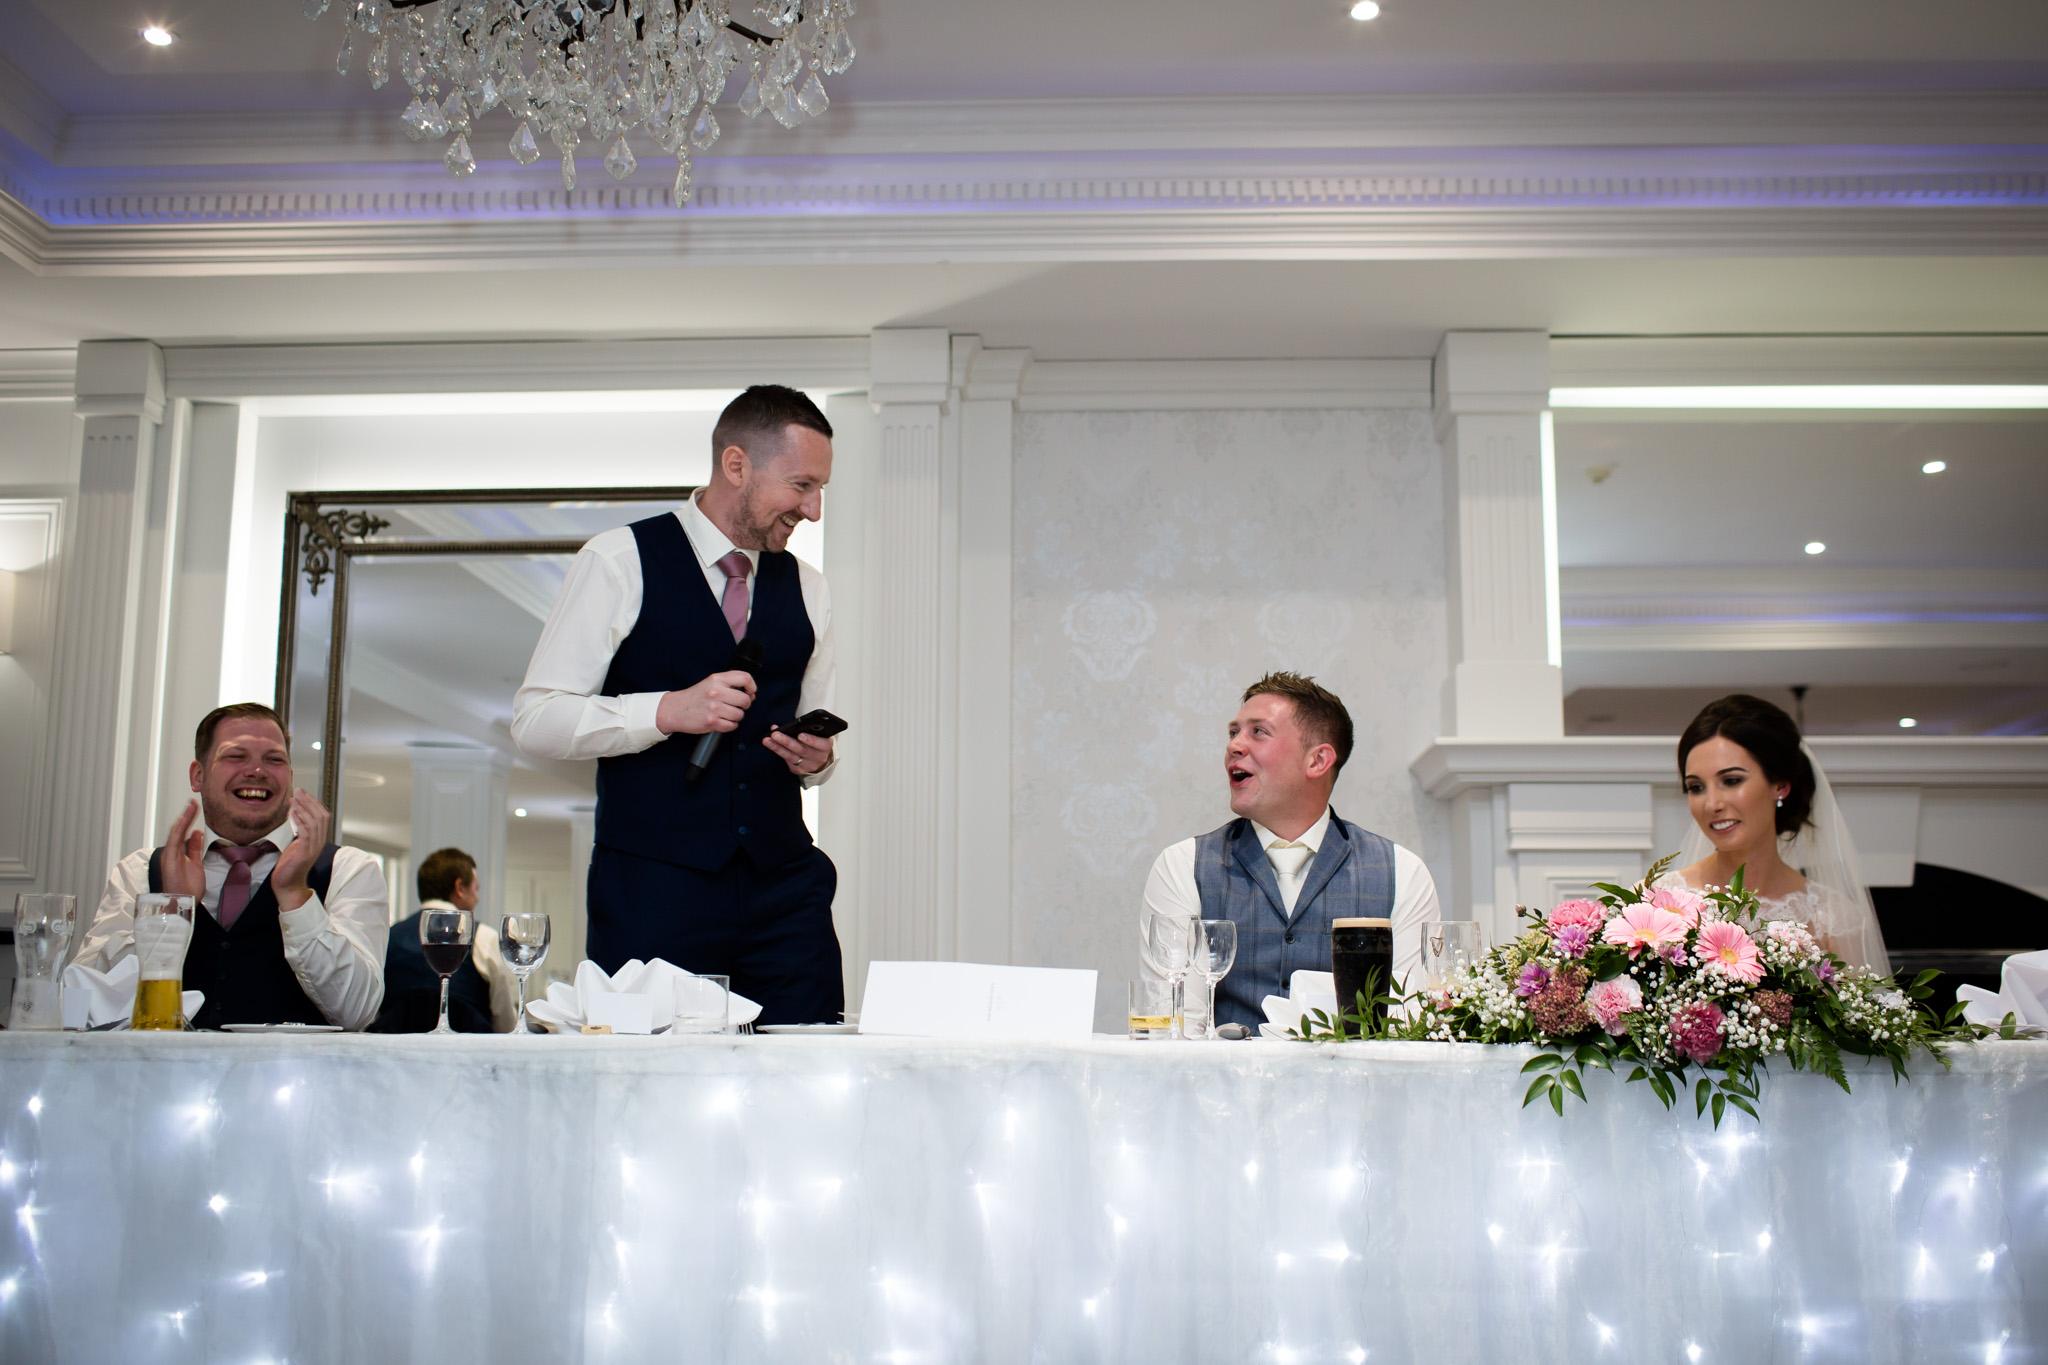 Mark_Barnes_Northern_Ireland_Wedding_Photography_Leighinmohr-house-hotel-ballymena_Wedding_Photography-58.jpg